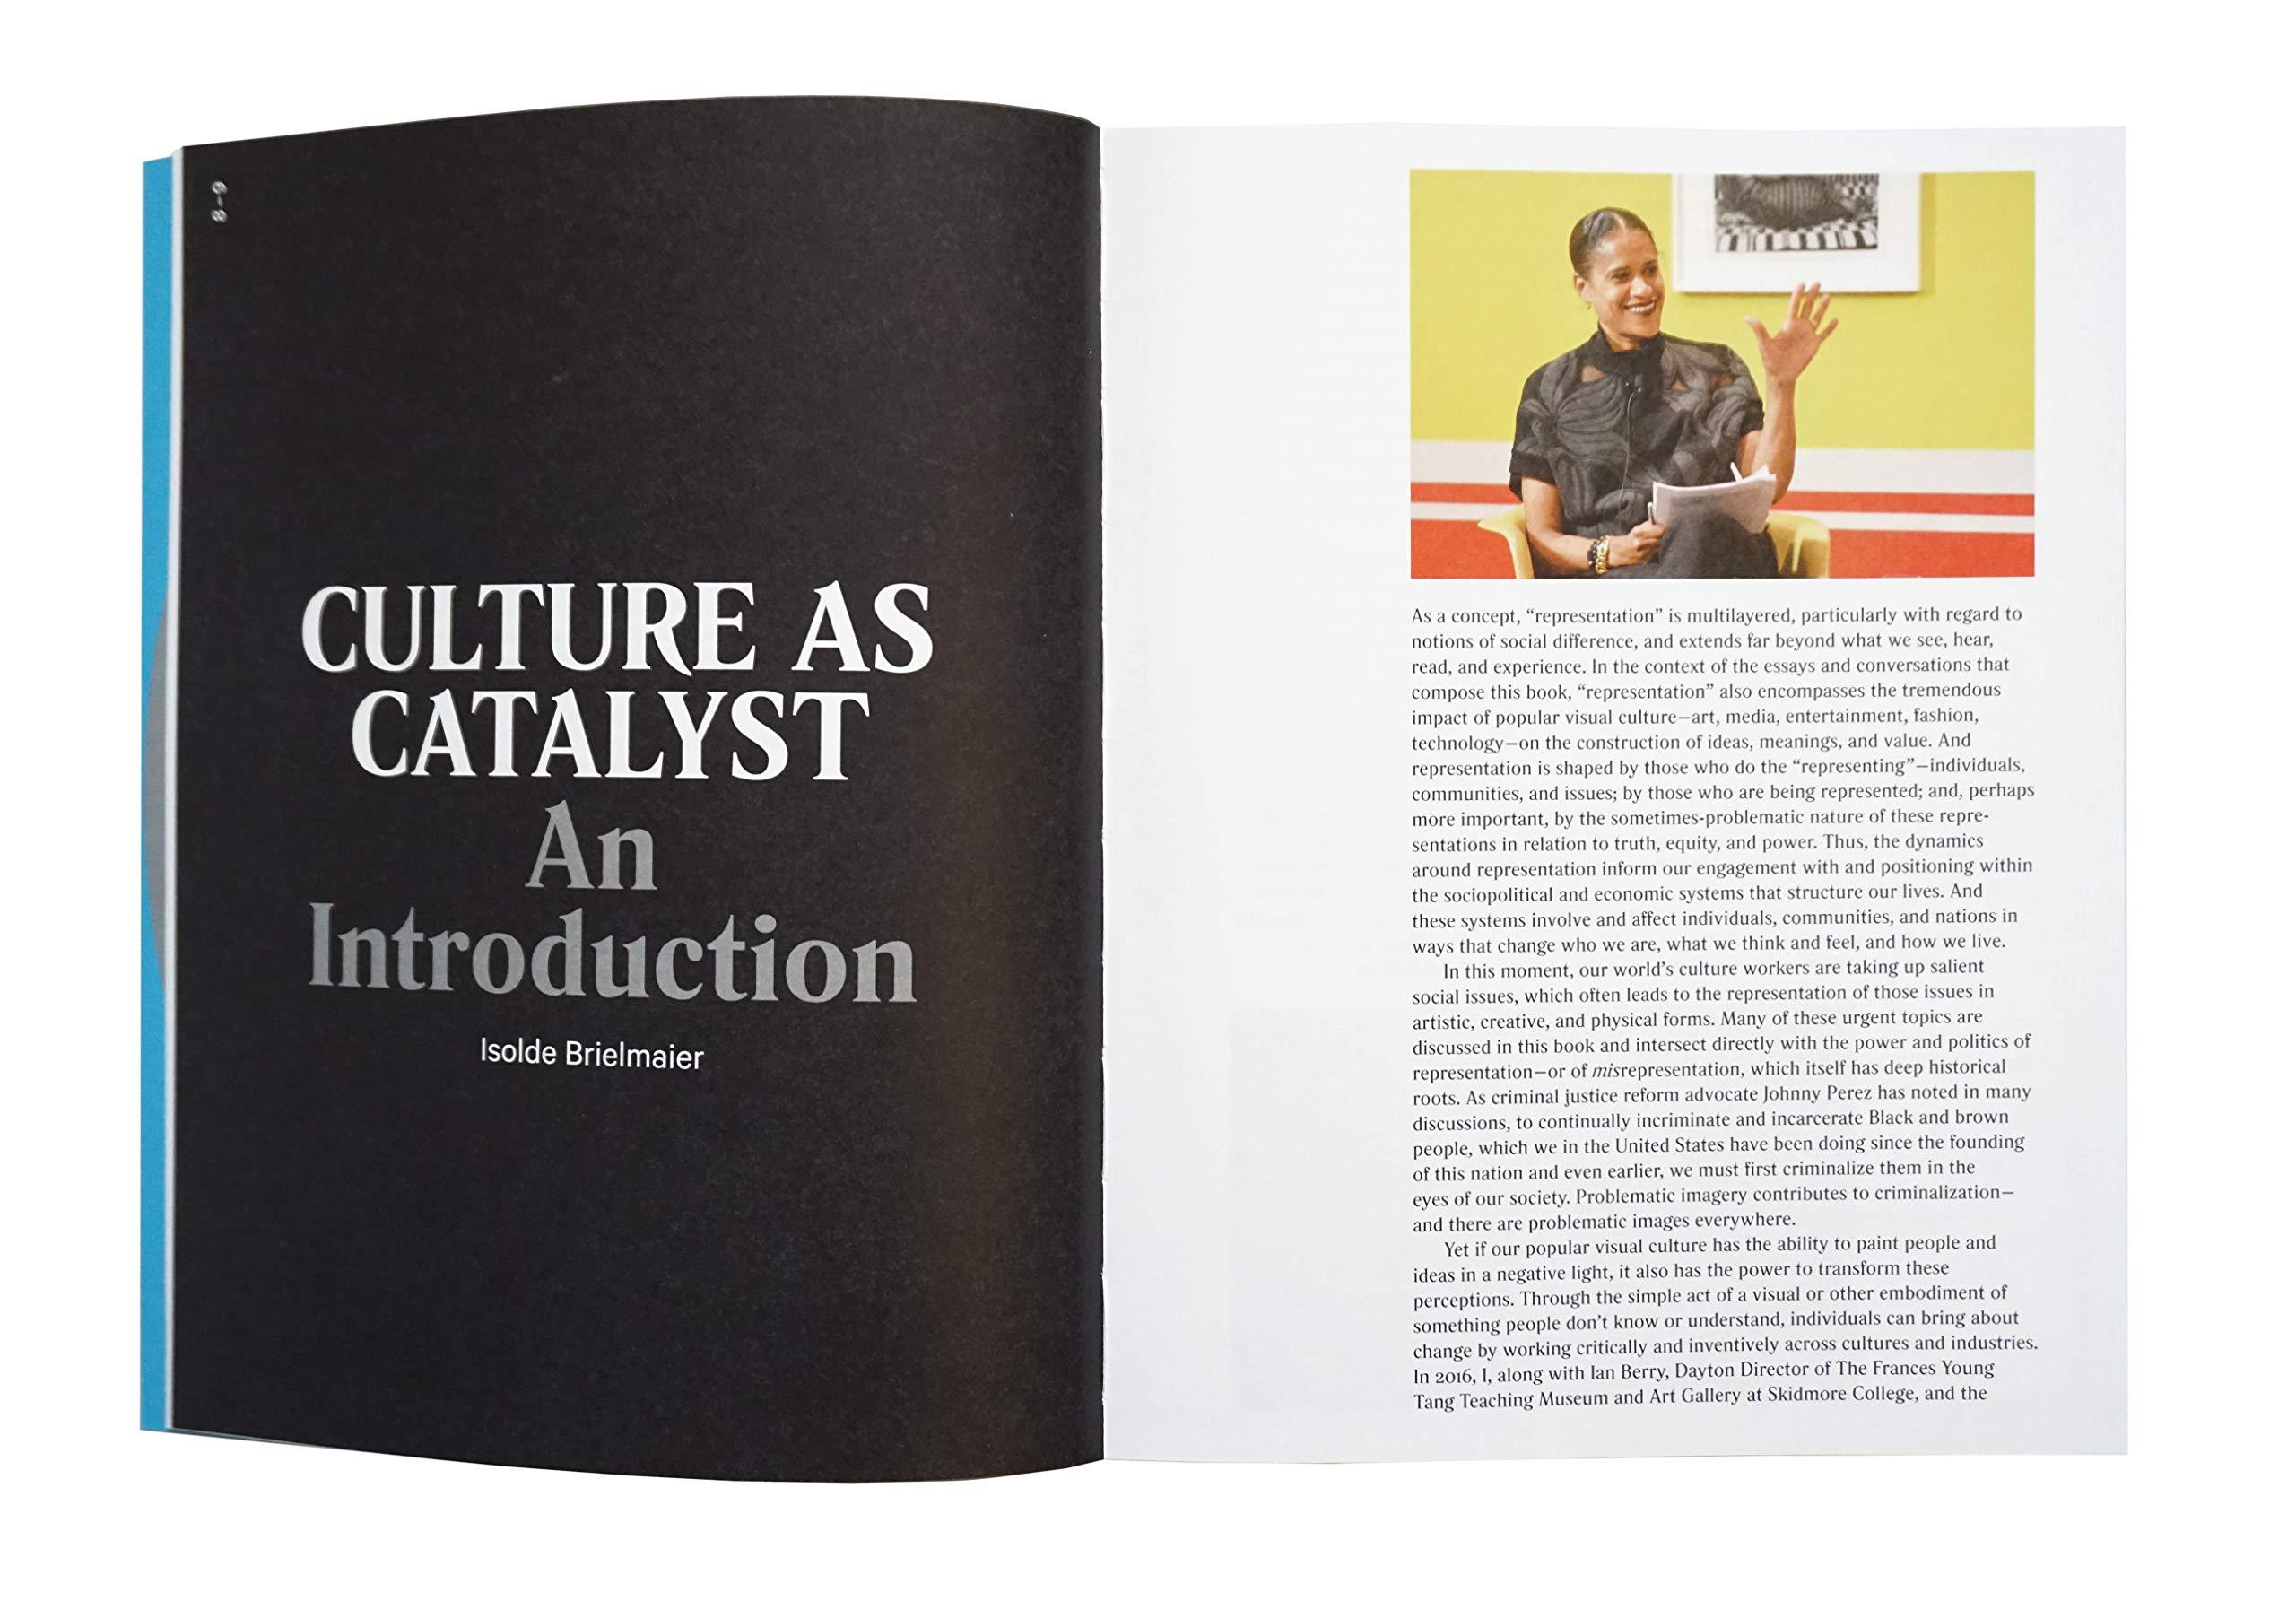 Isolde Brielmaier: Culture as Catalyst